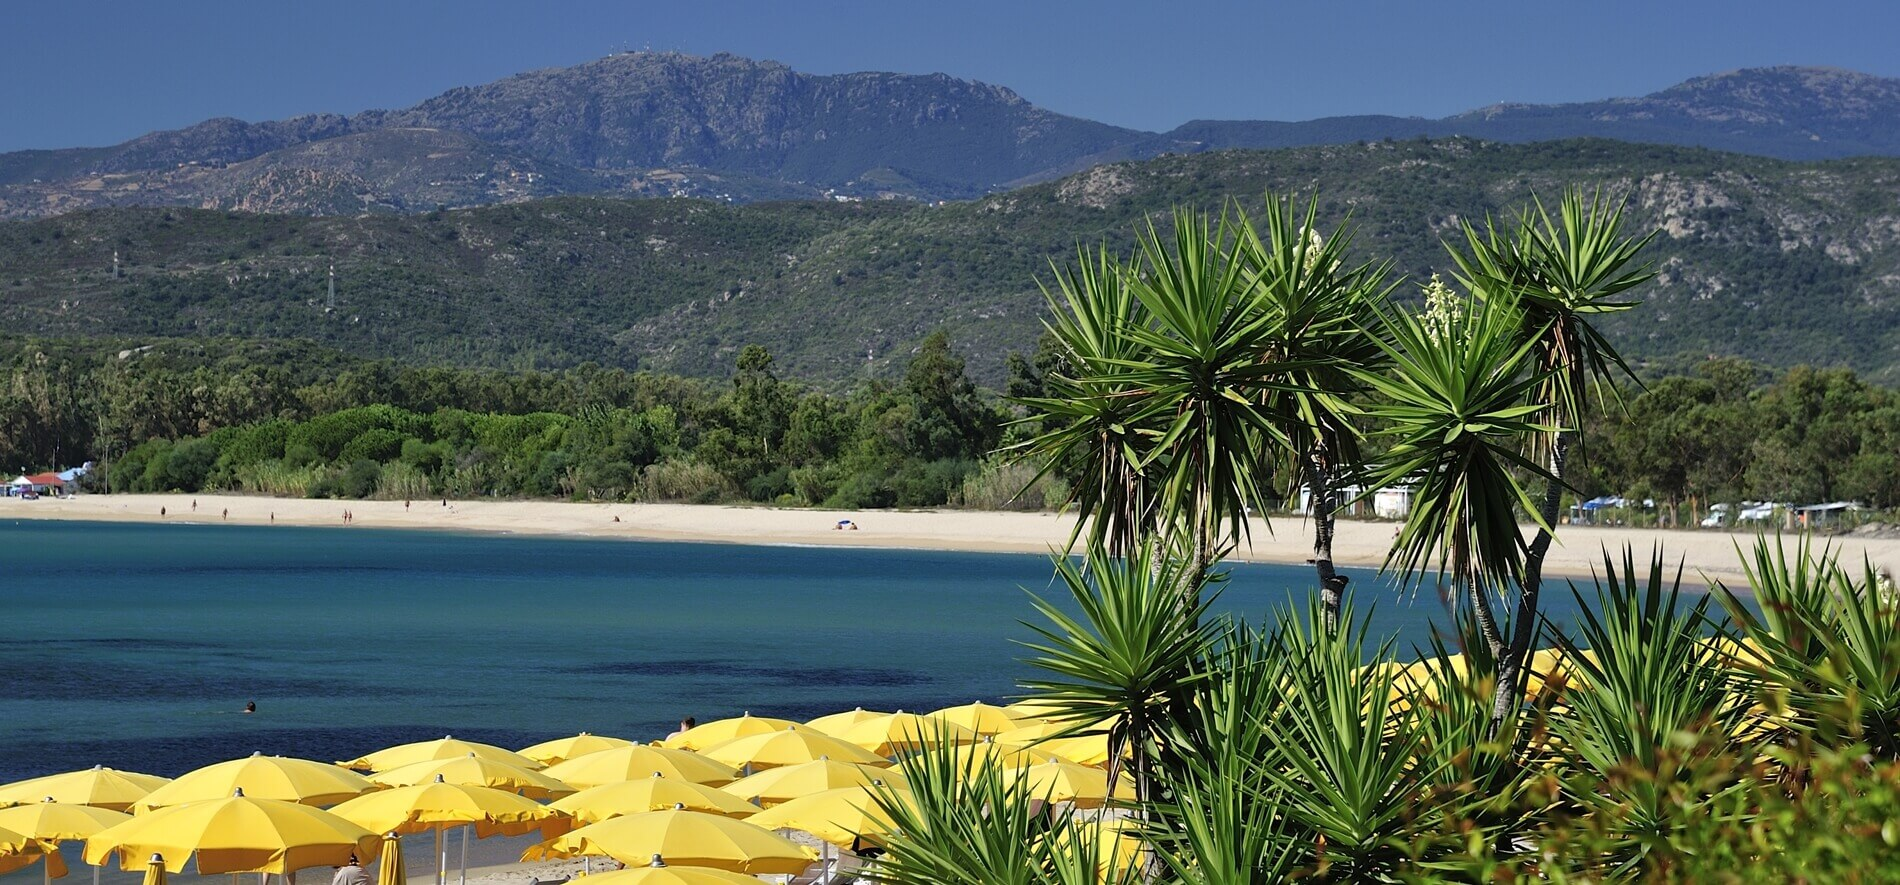 hotel_club_saraceno_resort_con_piscina_sardegna